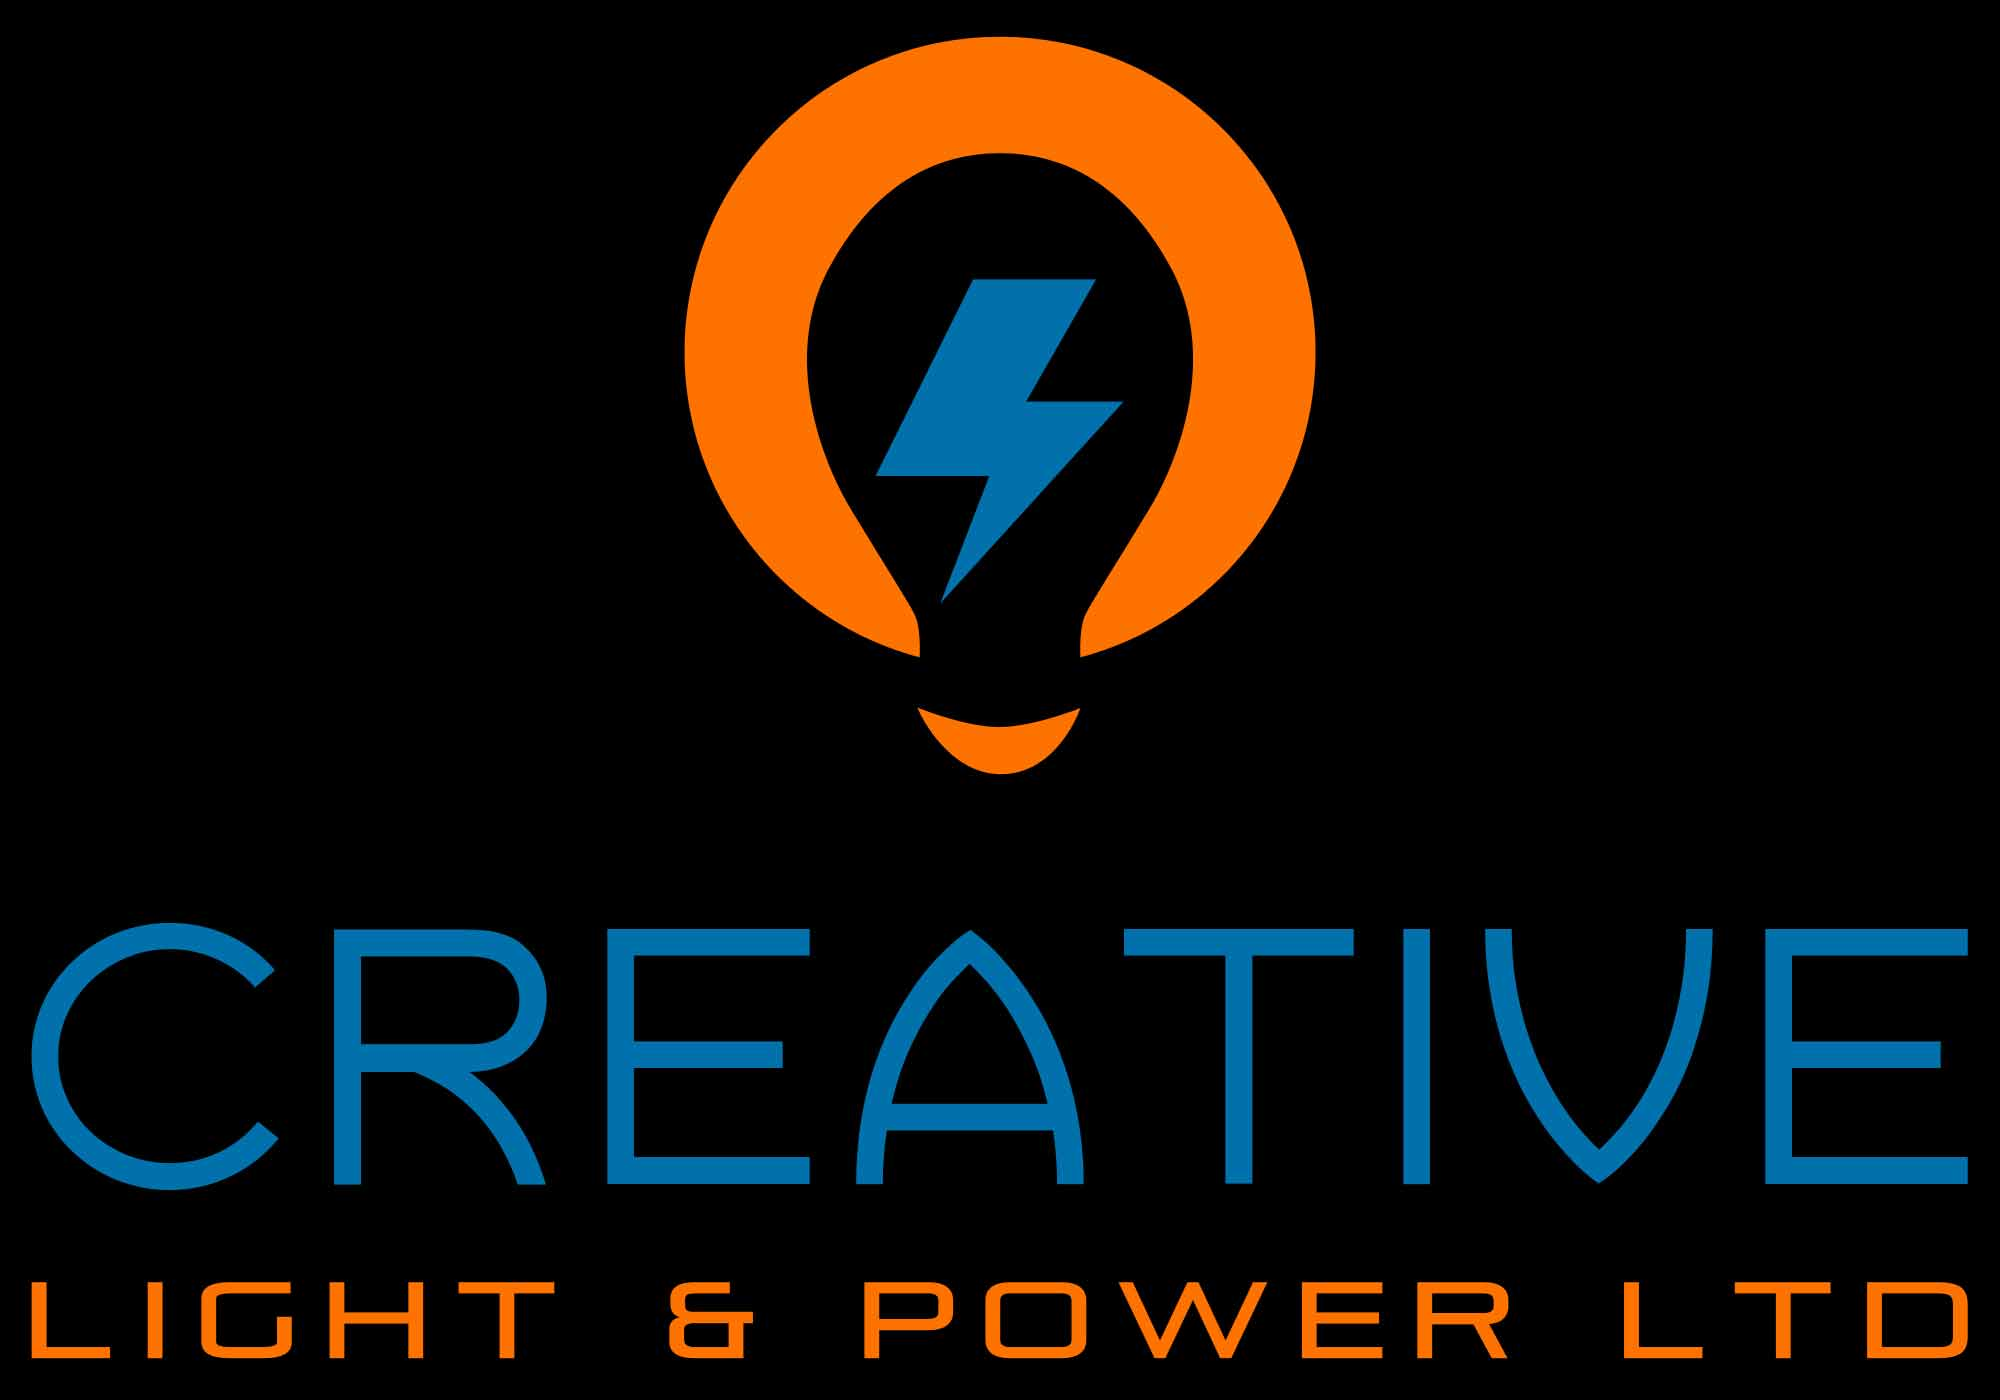 Creative Light & Power Ltd Verified Logo